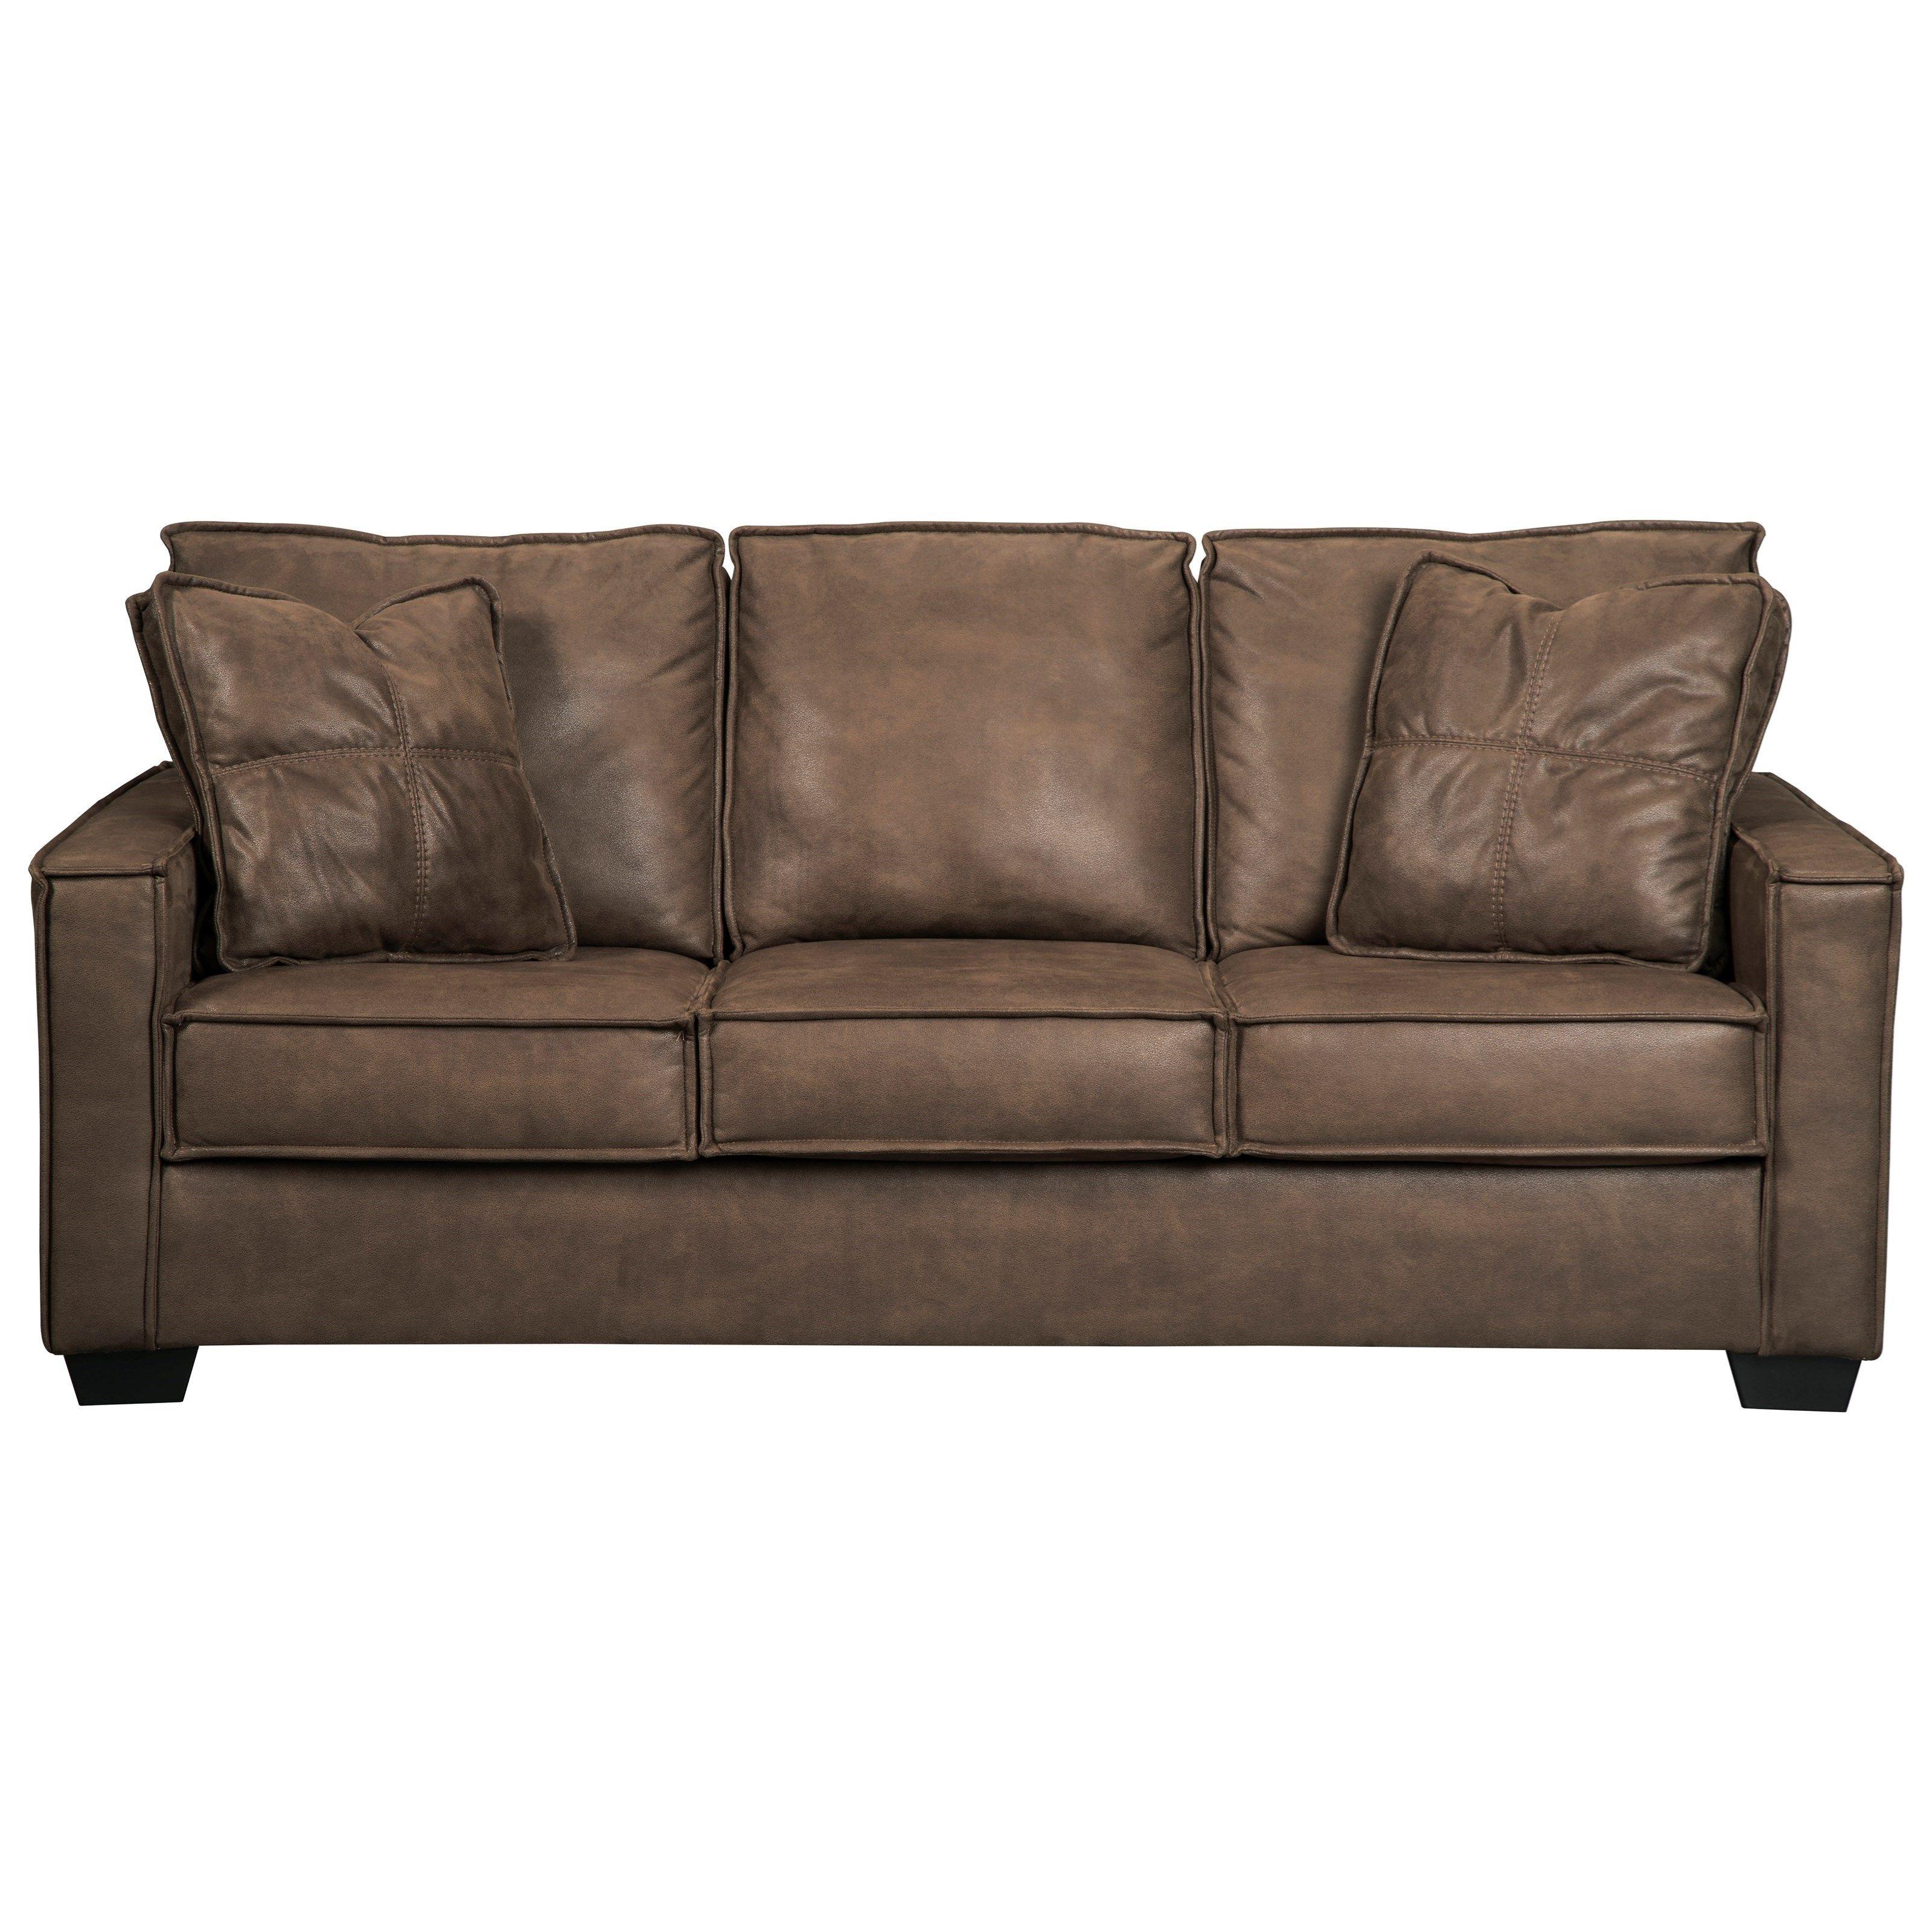 Faux Leather Queen Sofa Sleeper With Memory Foam Mattress U0026 Piecrust Welt  Trim